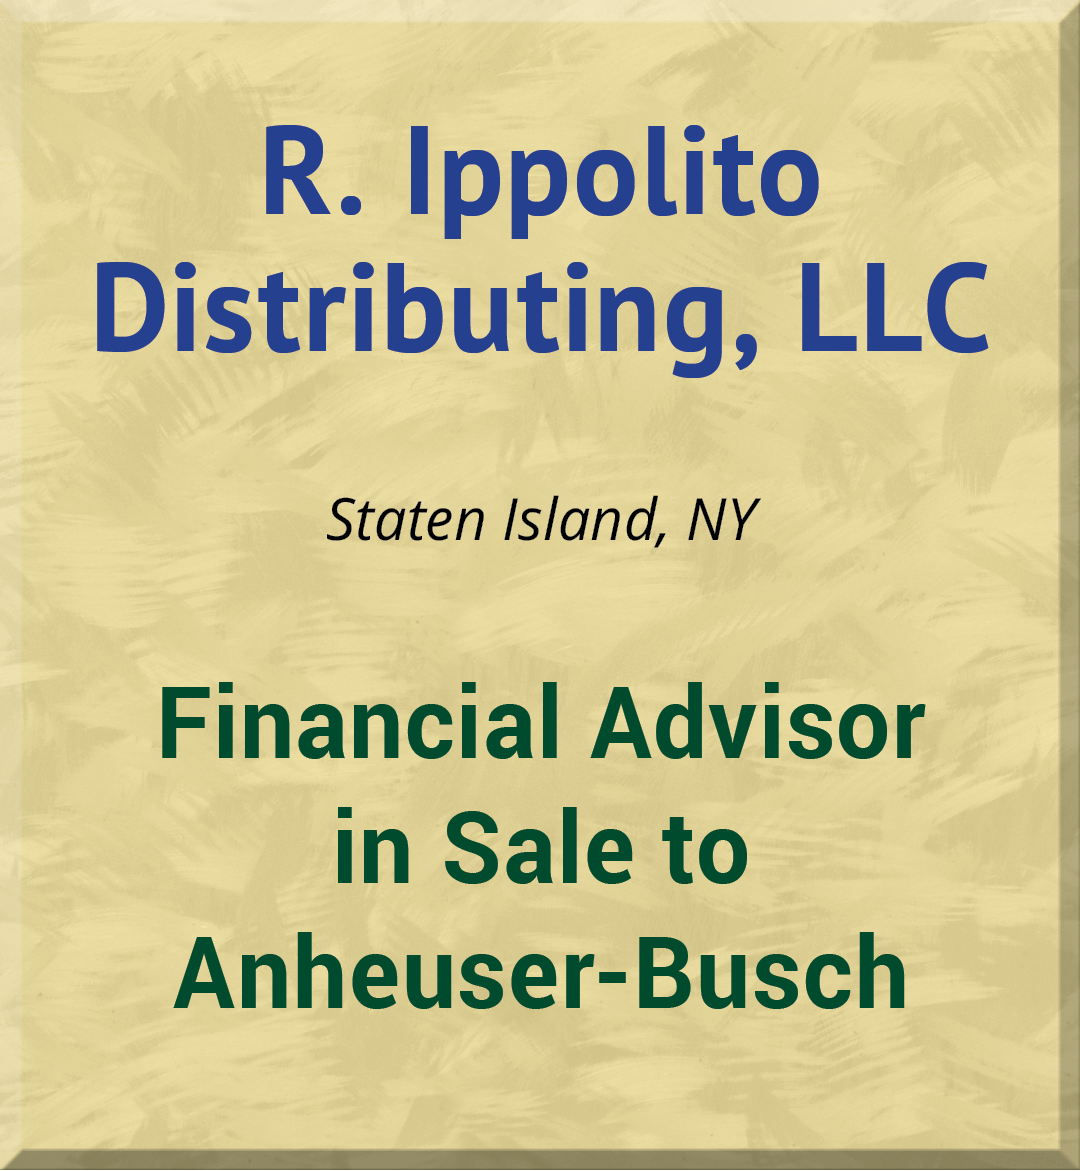 R. Ippolito Distributing, LLC